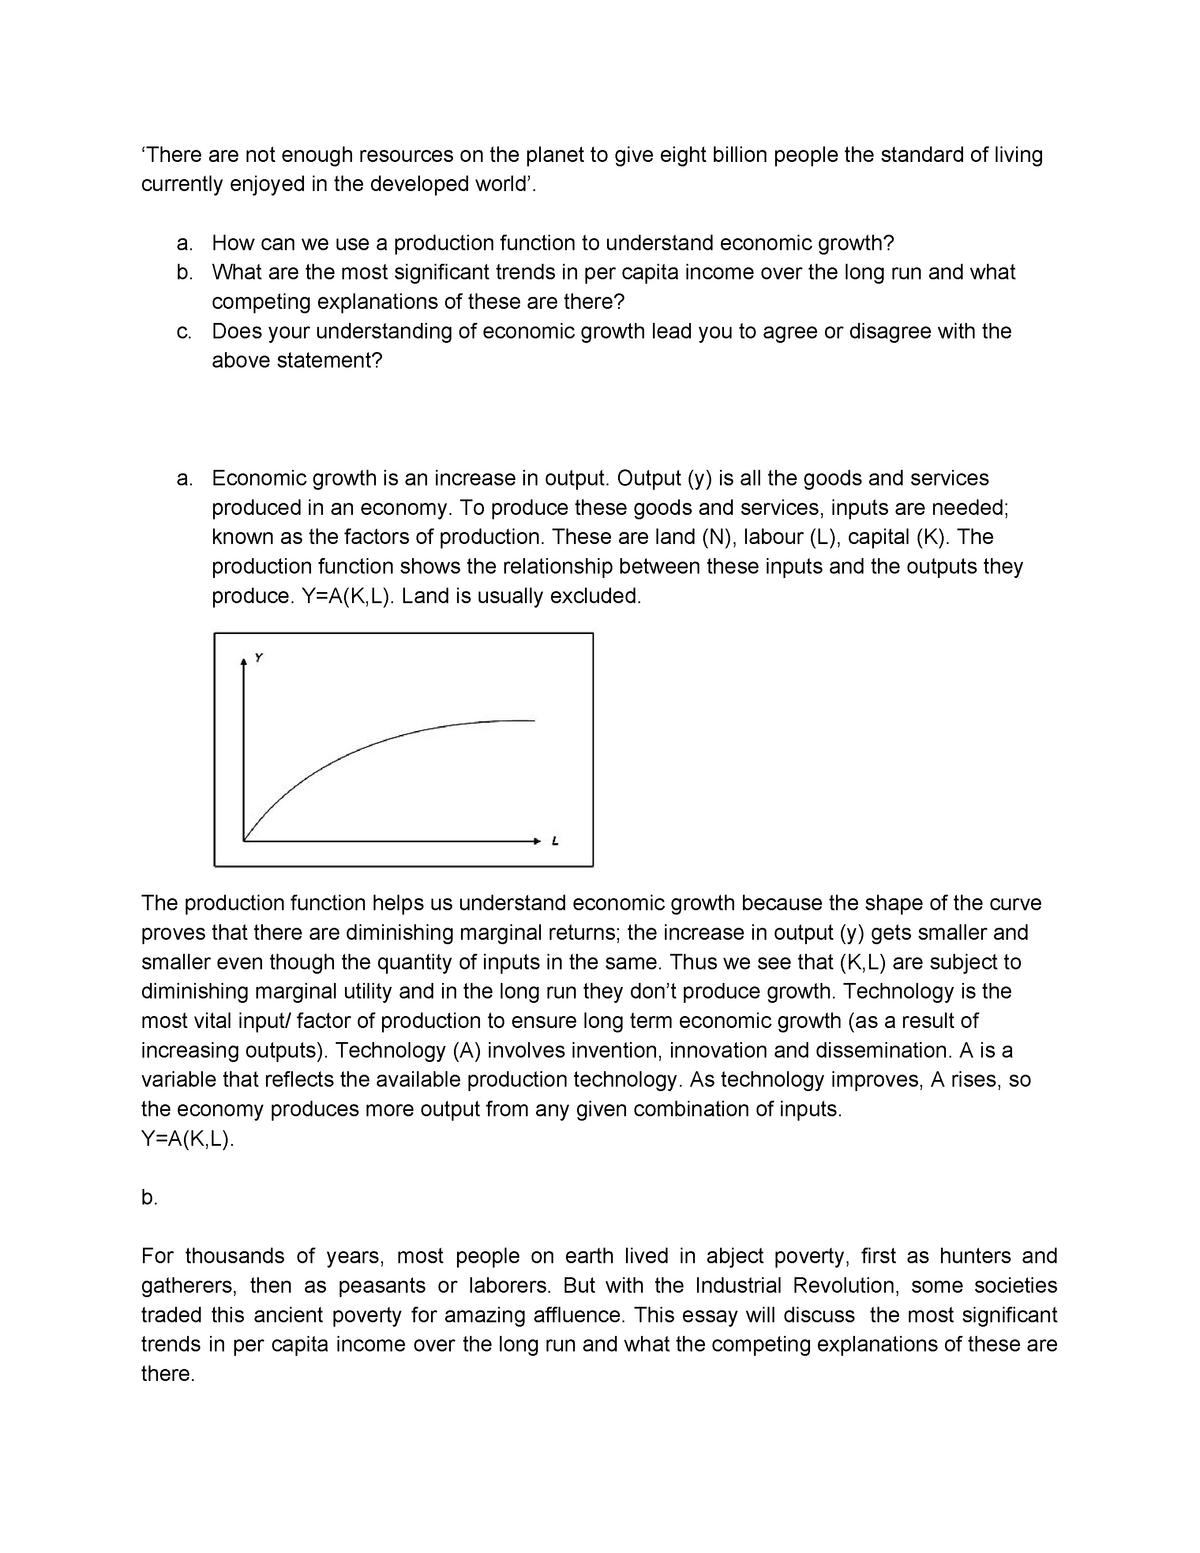 Appic essay